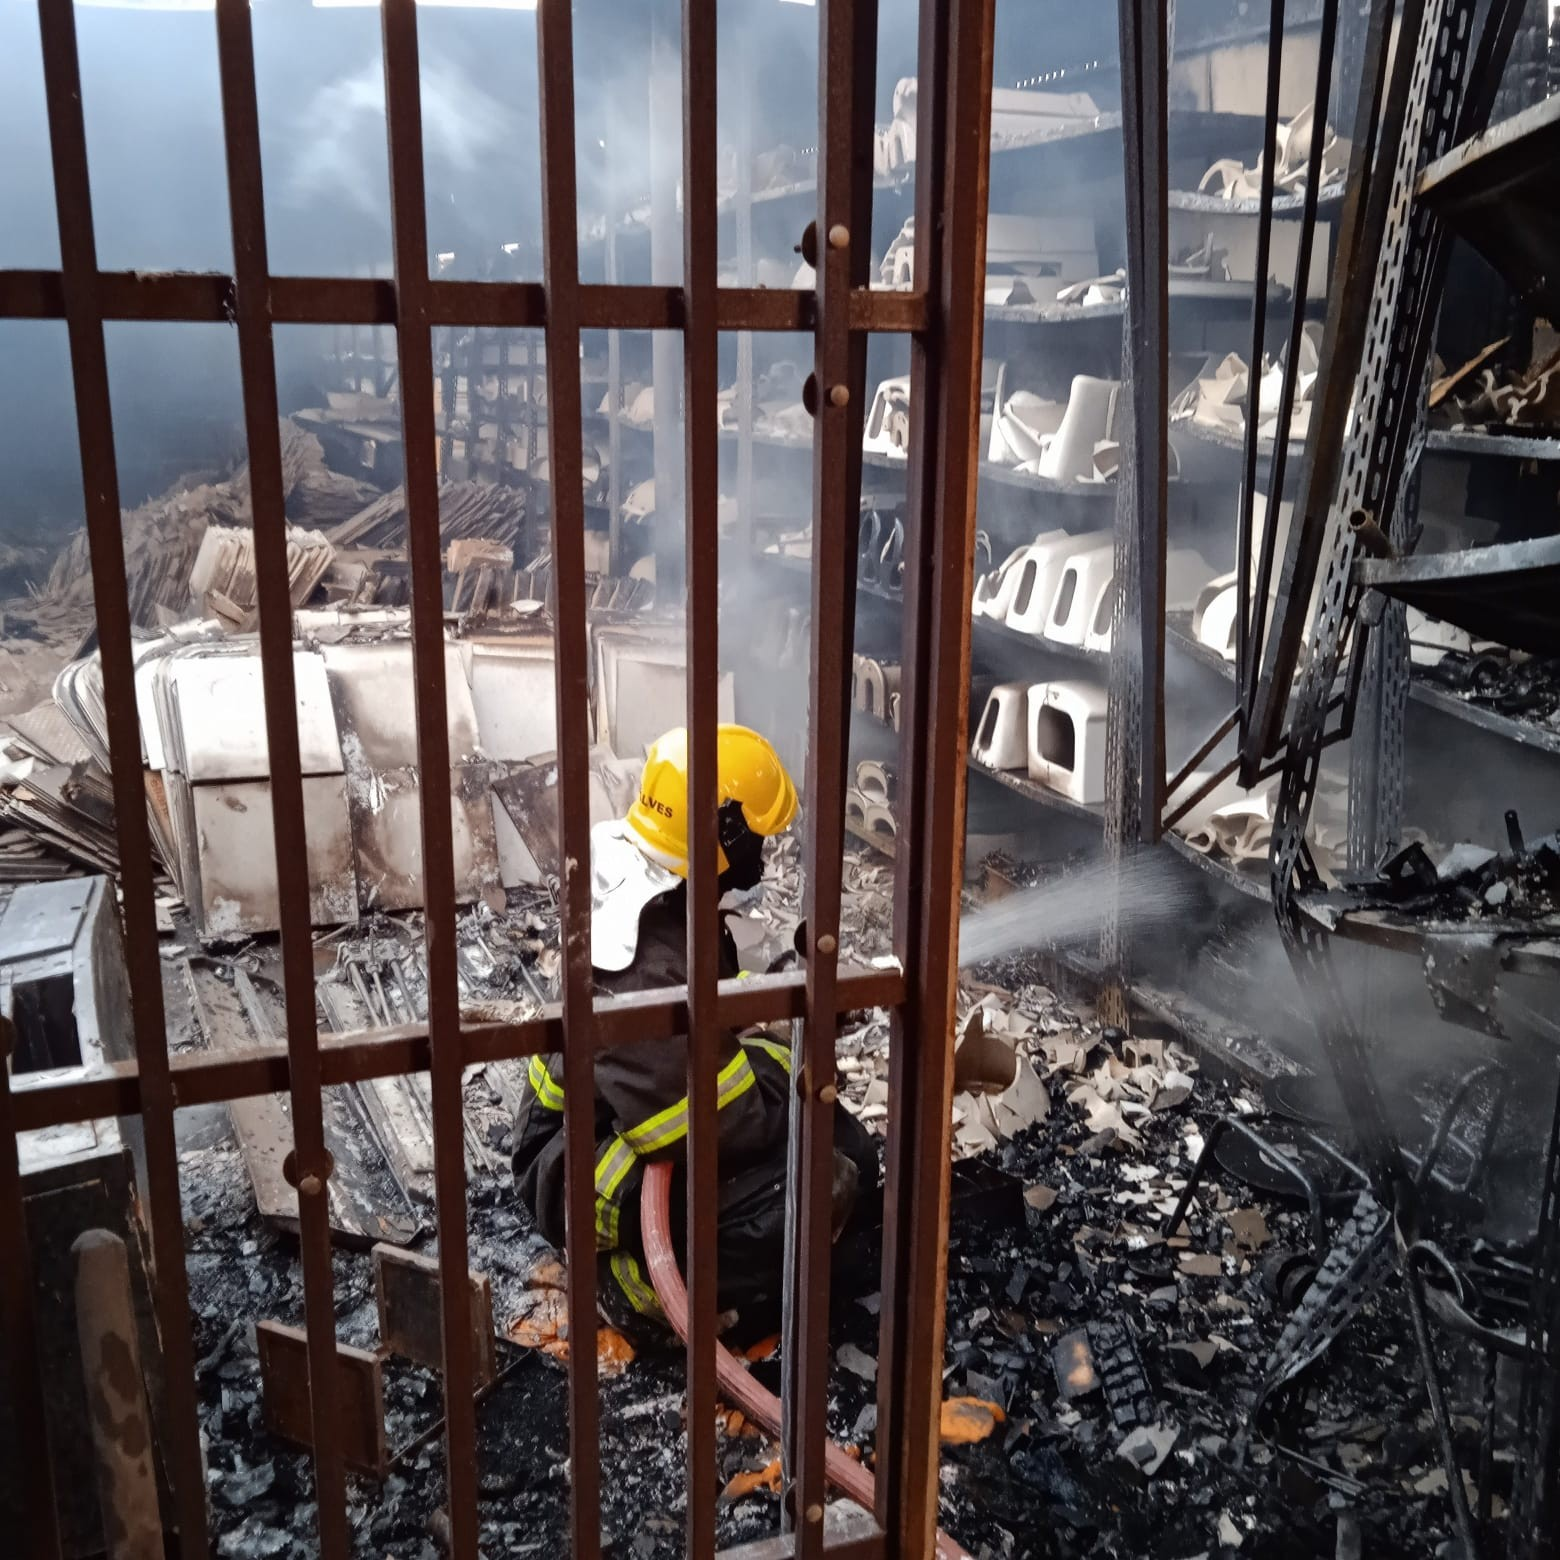 VÍDEO: incêndio destrói depósito de construtora em Uberaba